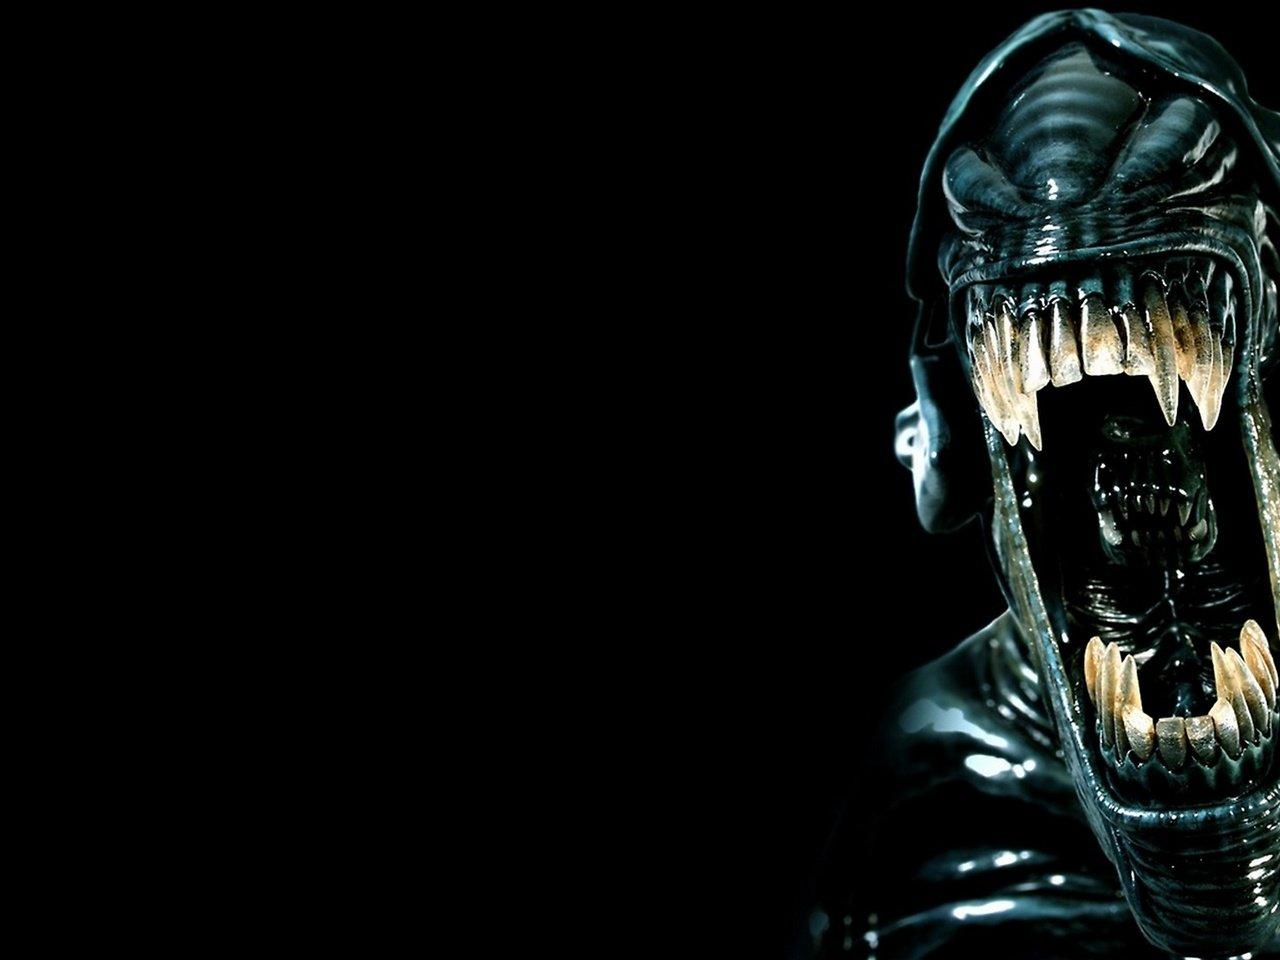 Alien pics in 3d adult films